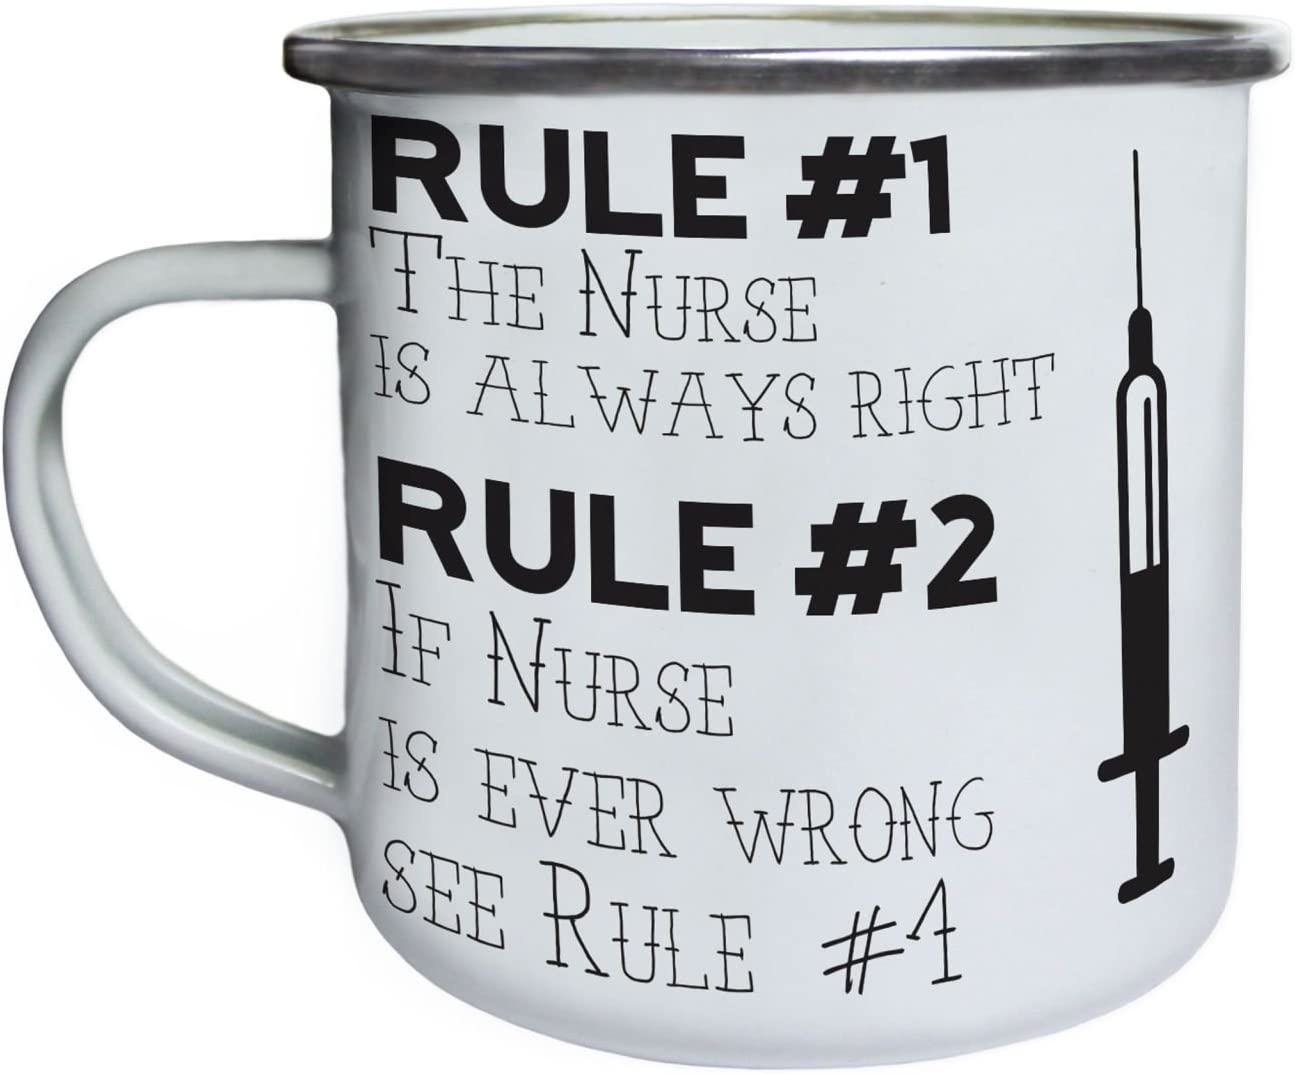 Enamel 10oz Mug cc557e rule 1 the nurse is always right Retro,Tin